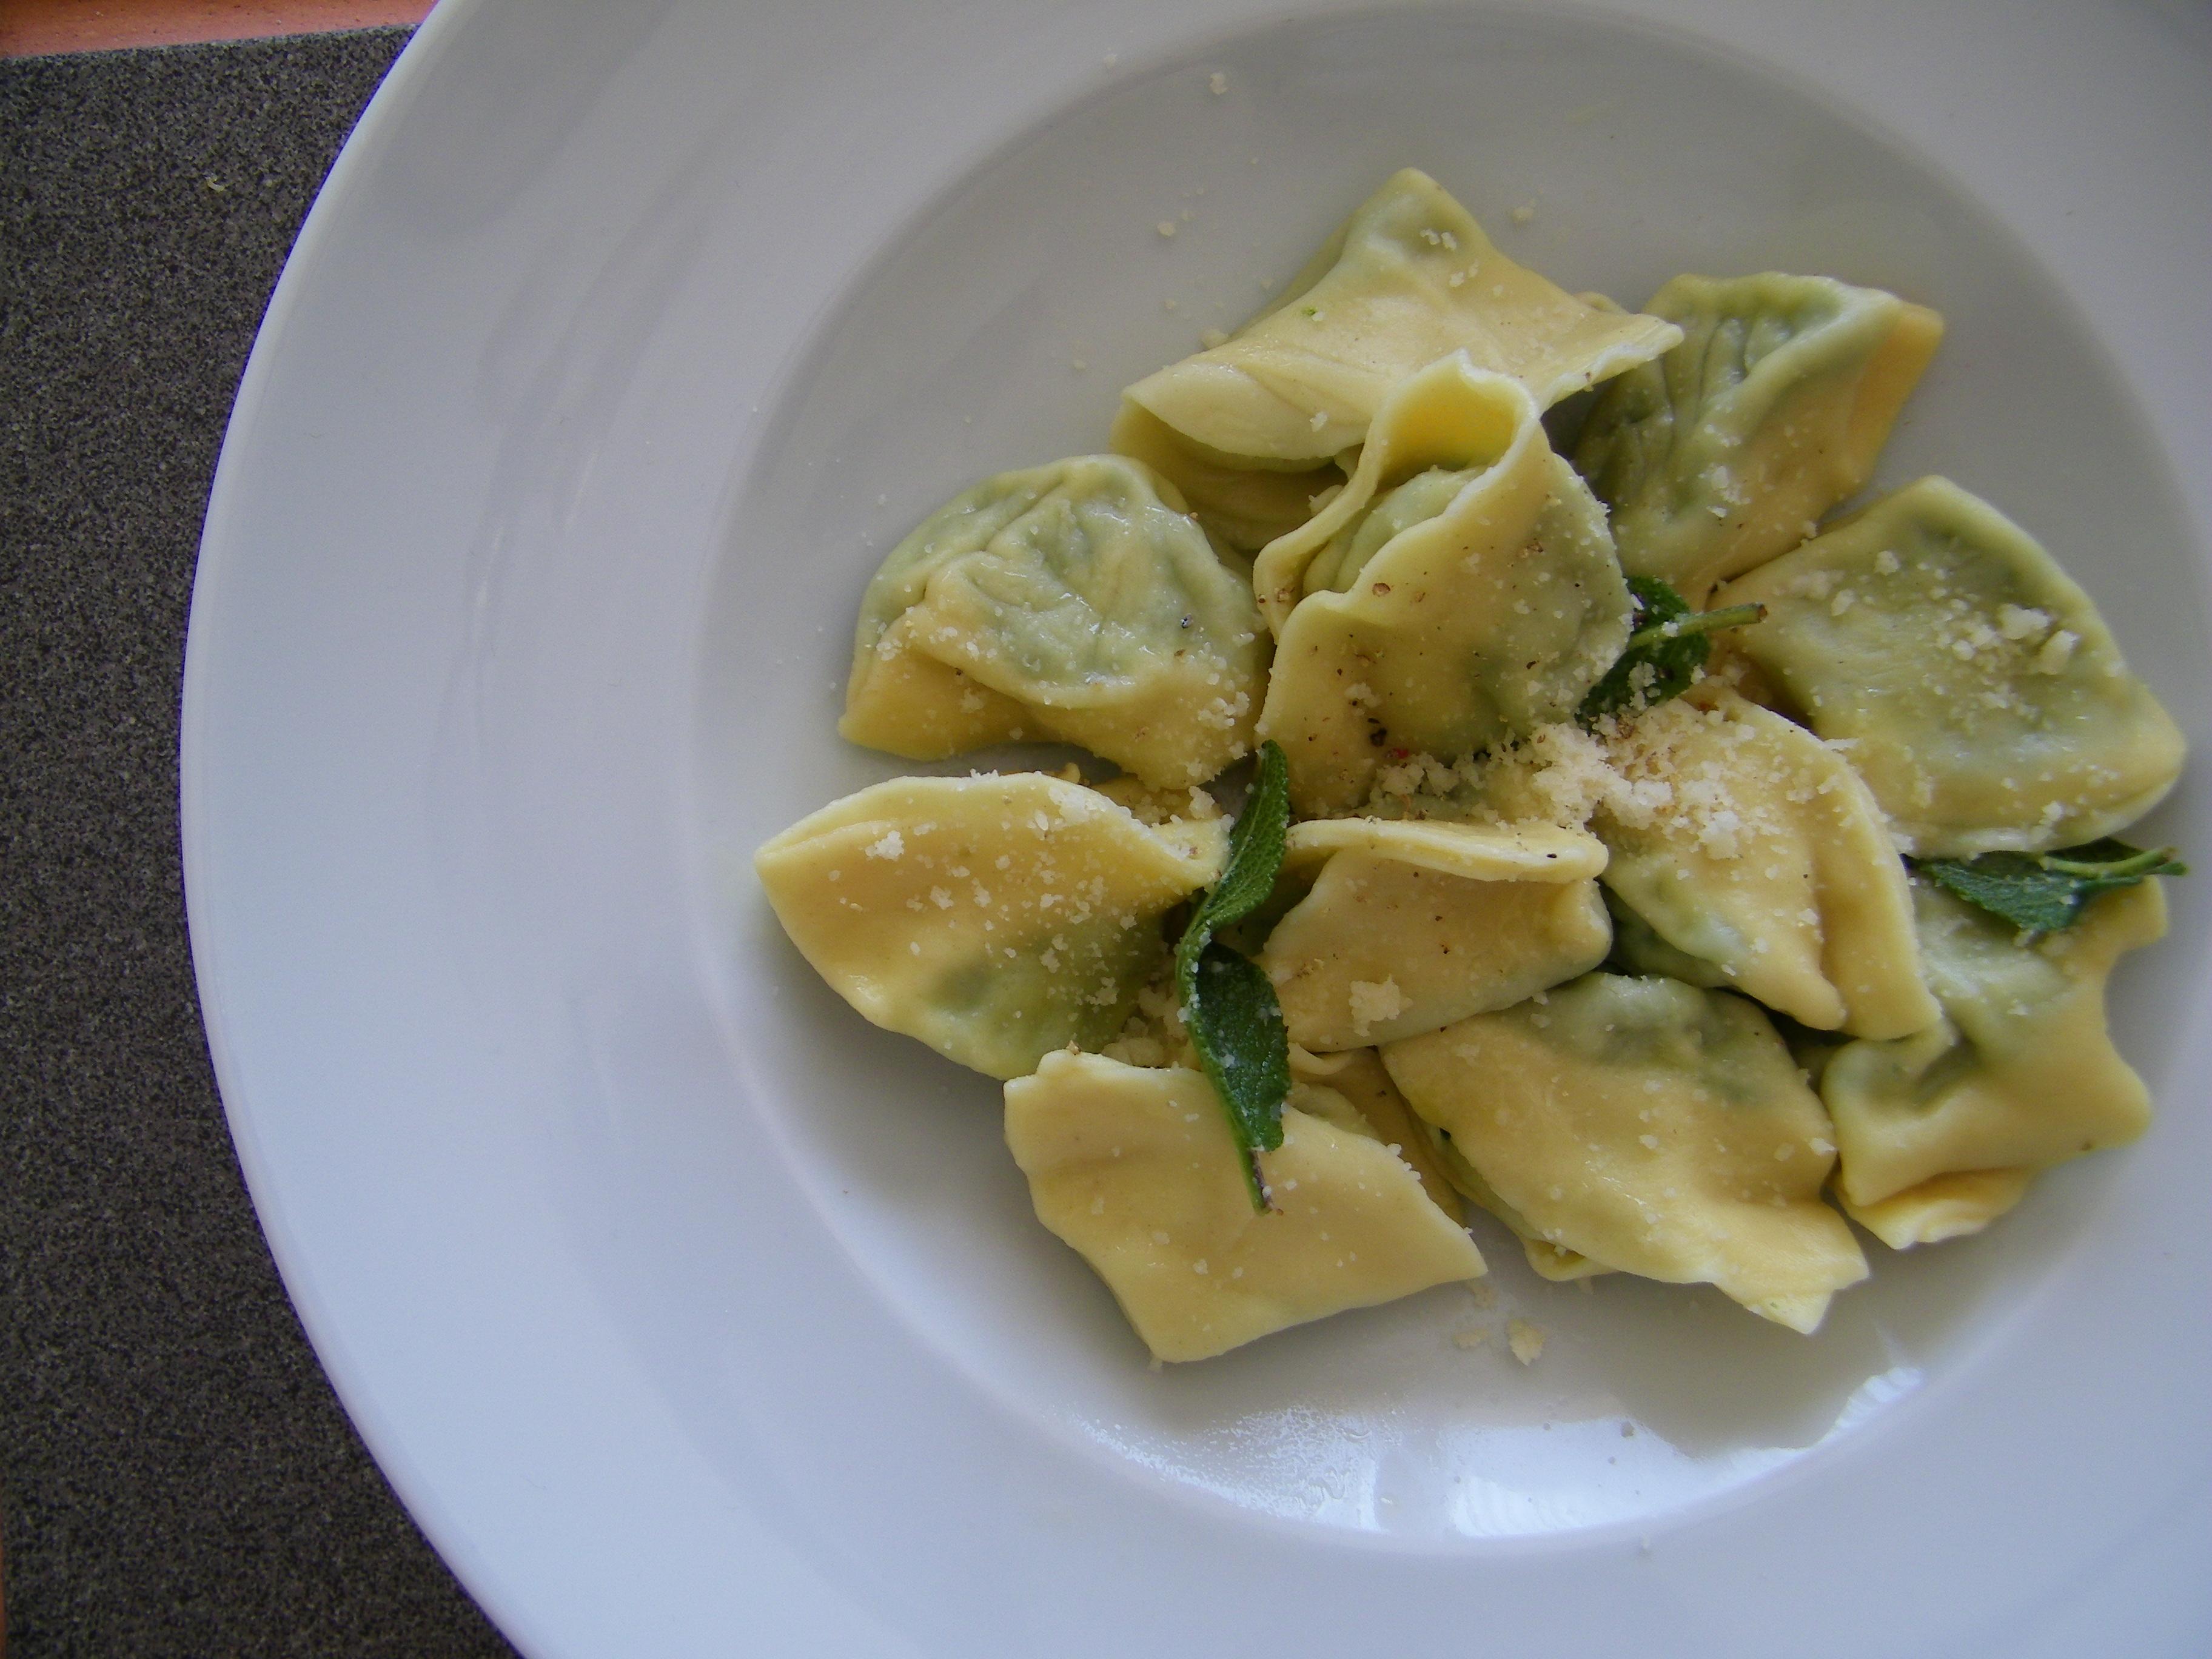 Spinach and Ricotta Tortellini